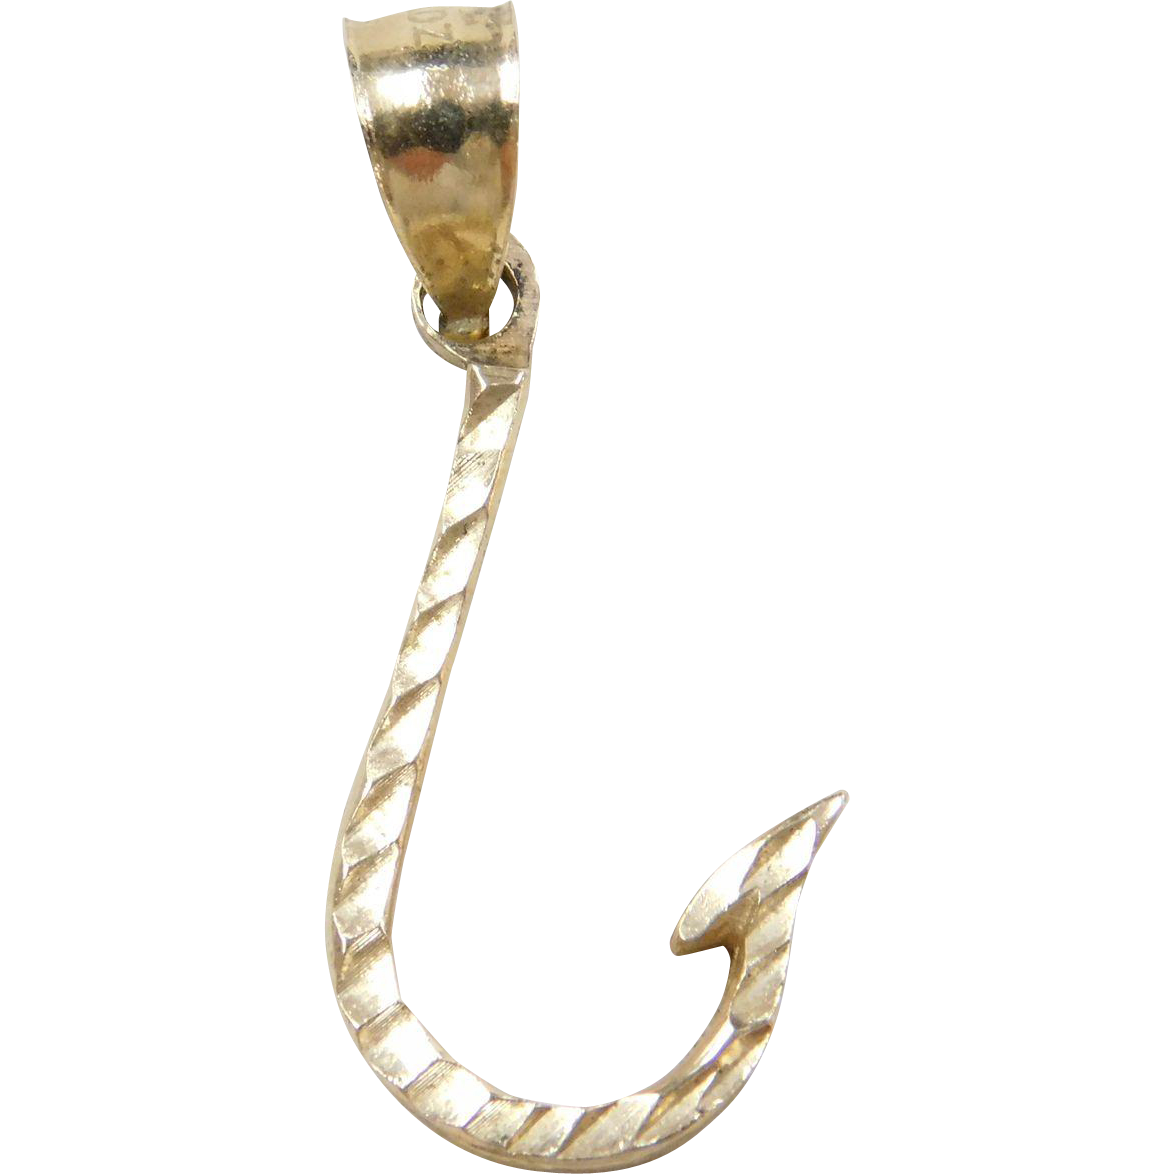 Vintage 14k gold fish hook charm arnold jewelers ruby lane for Gold fish hook necklace